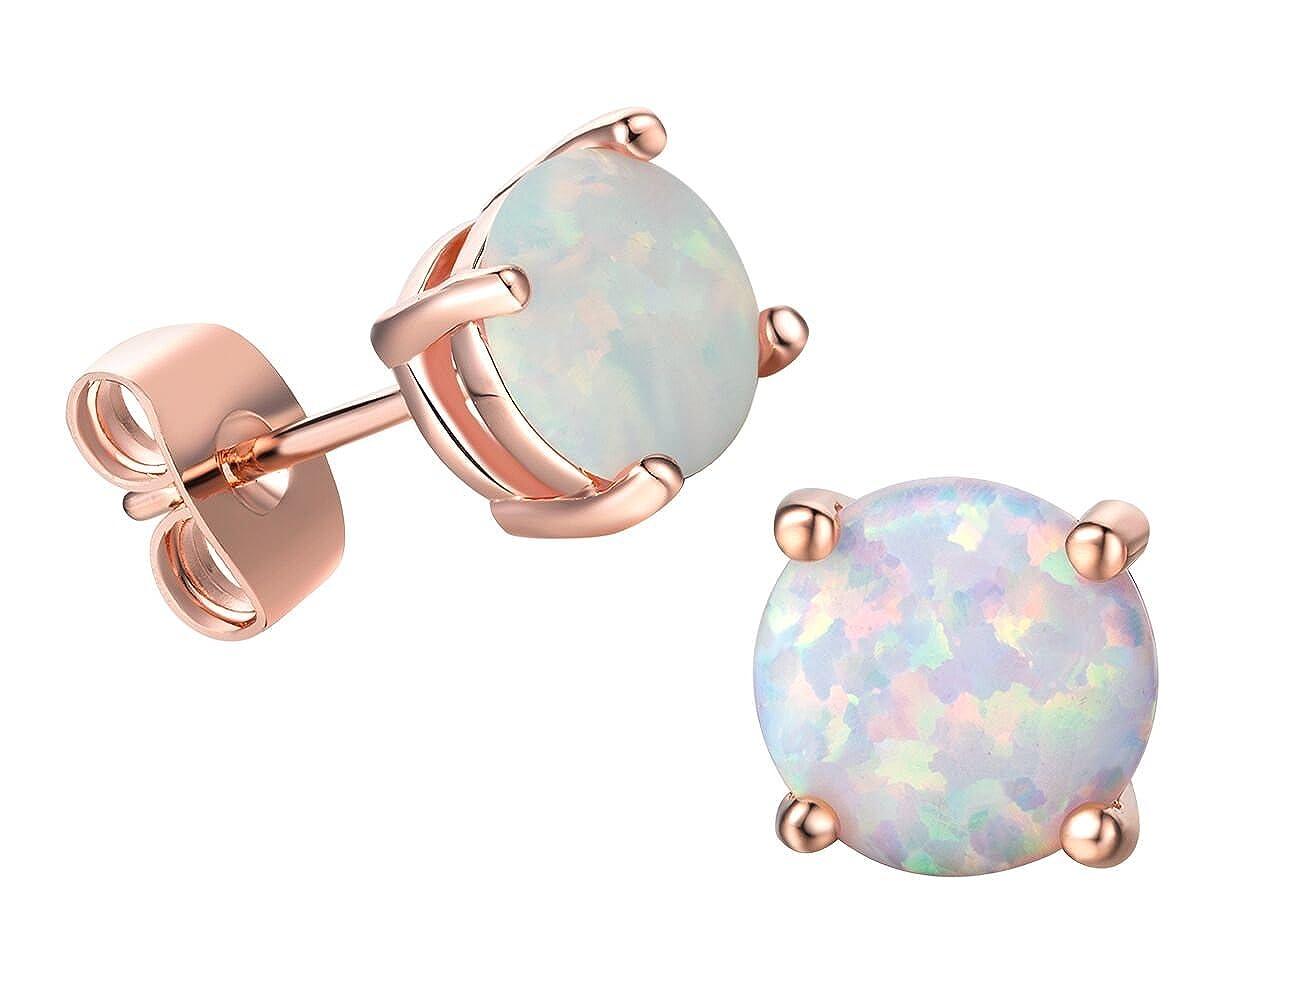 18K Rose Gold Plated Earrings Birthstone for Women Girls 8mm set Round Created Opal Stud Earrings Sets